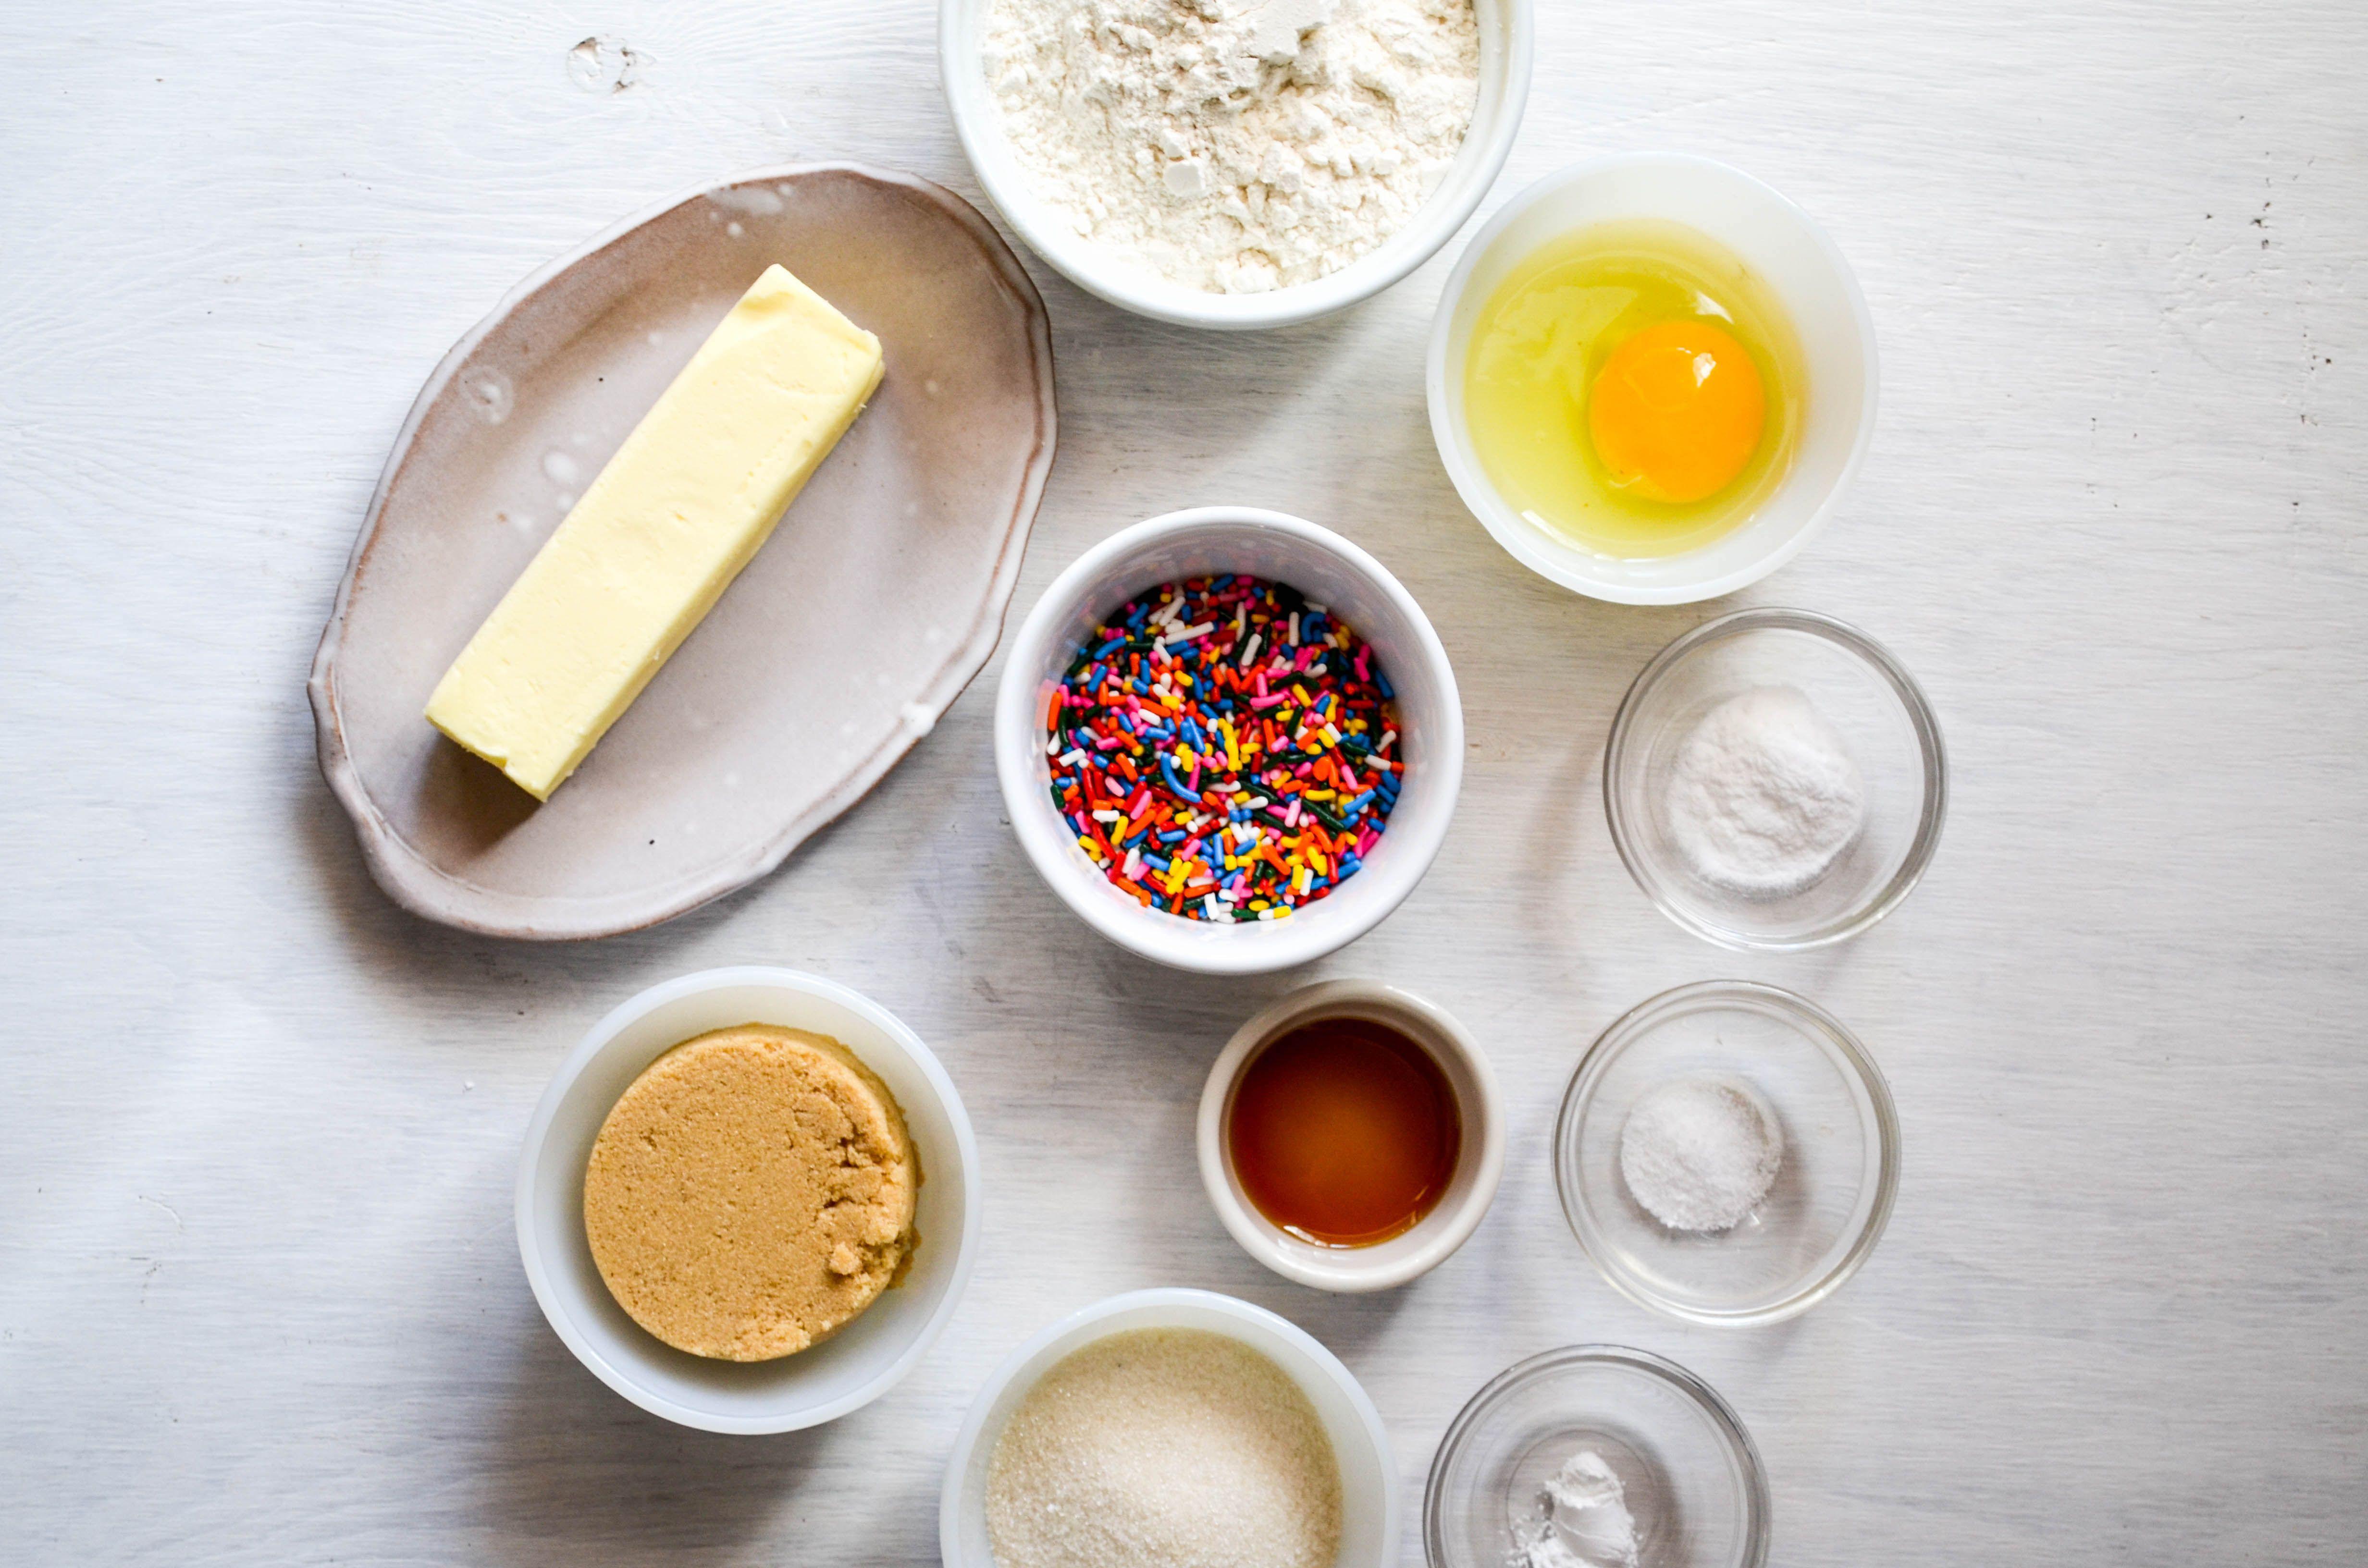 Funfetti Cookie Ingredients